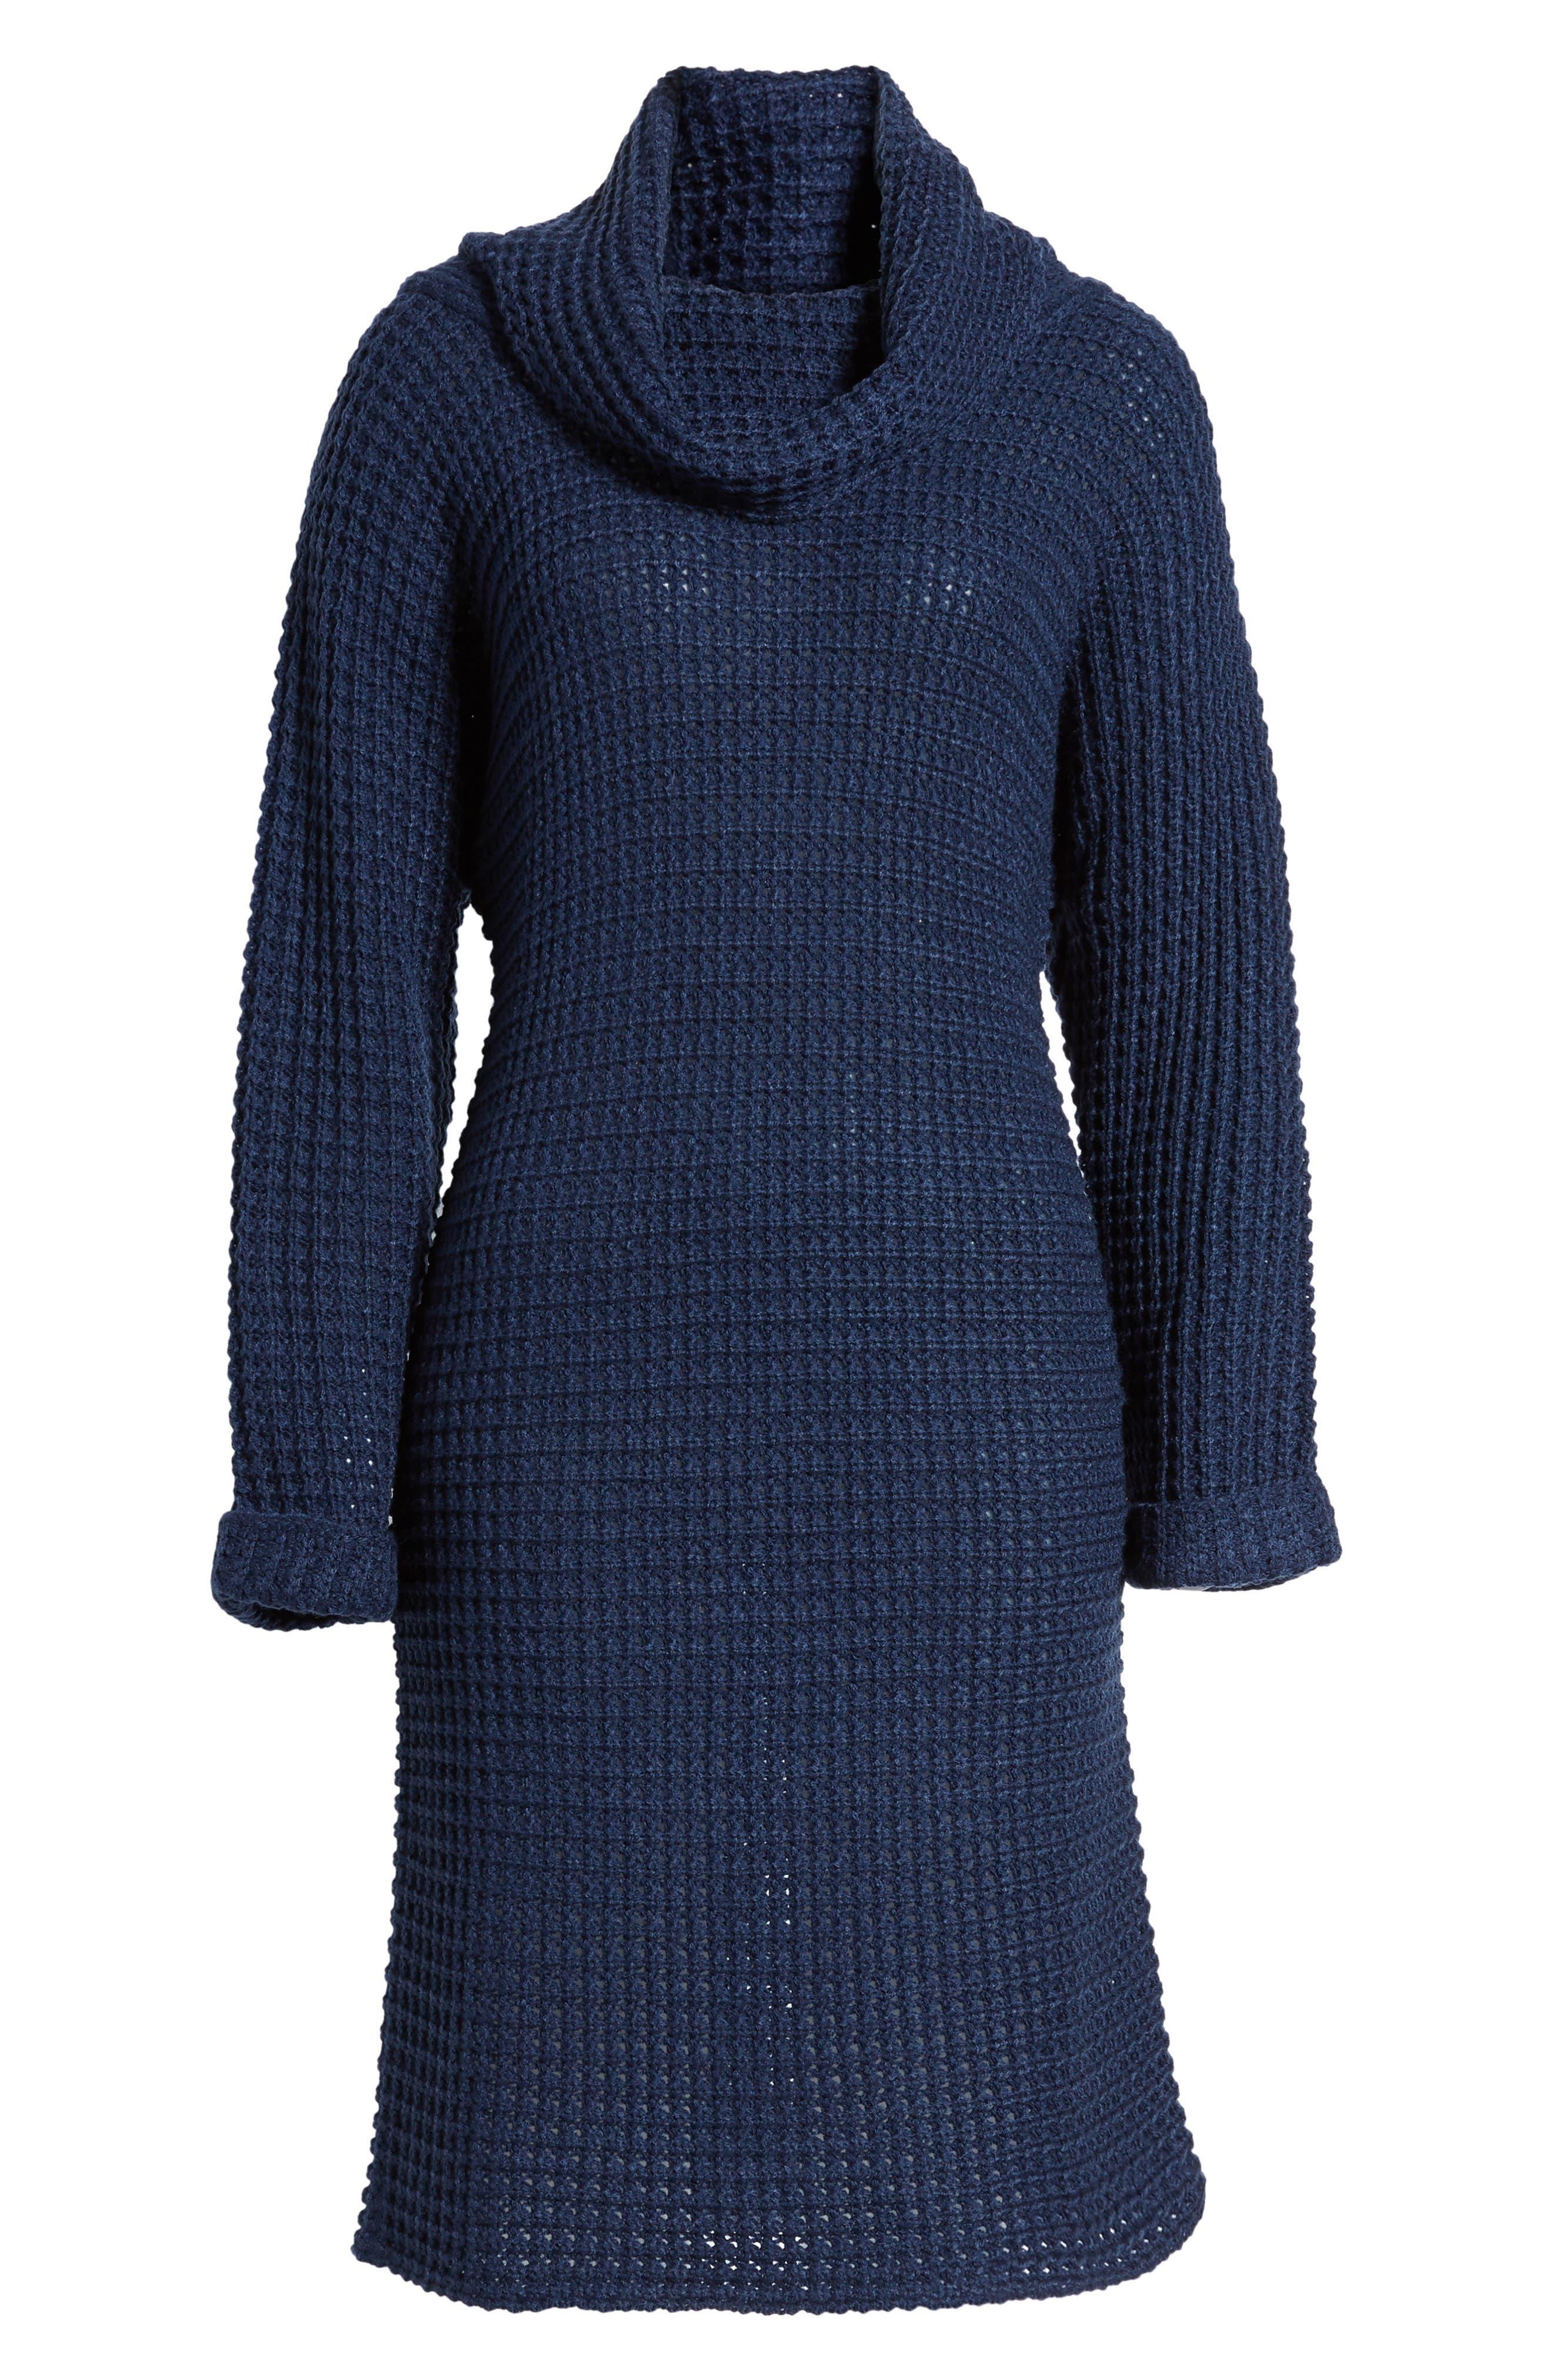 Turtleneck Sweater Dress,                             Alternate thumbnail 6, color,                             410